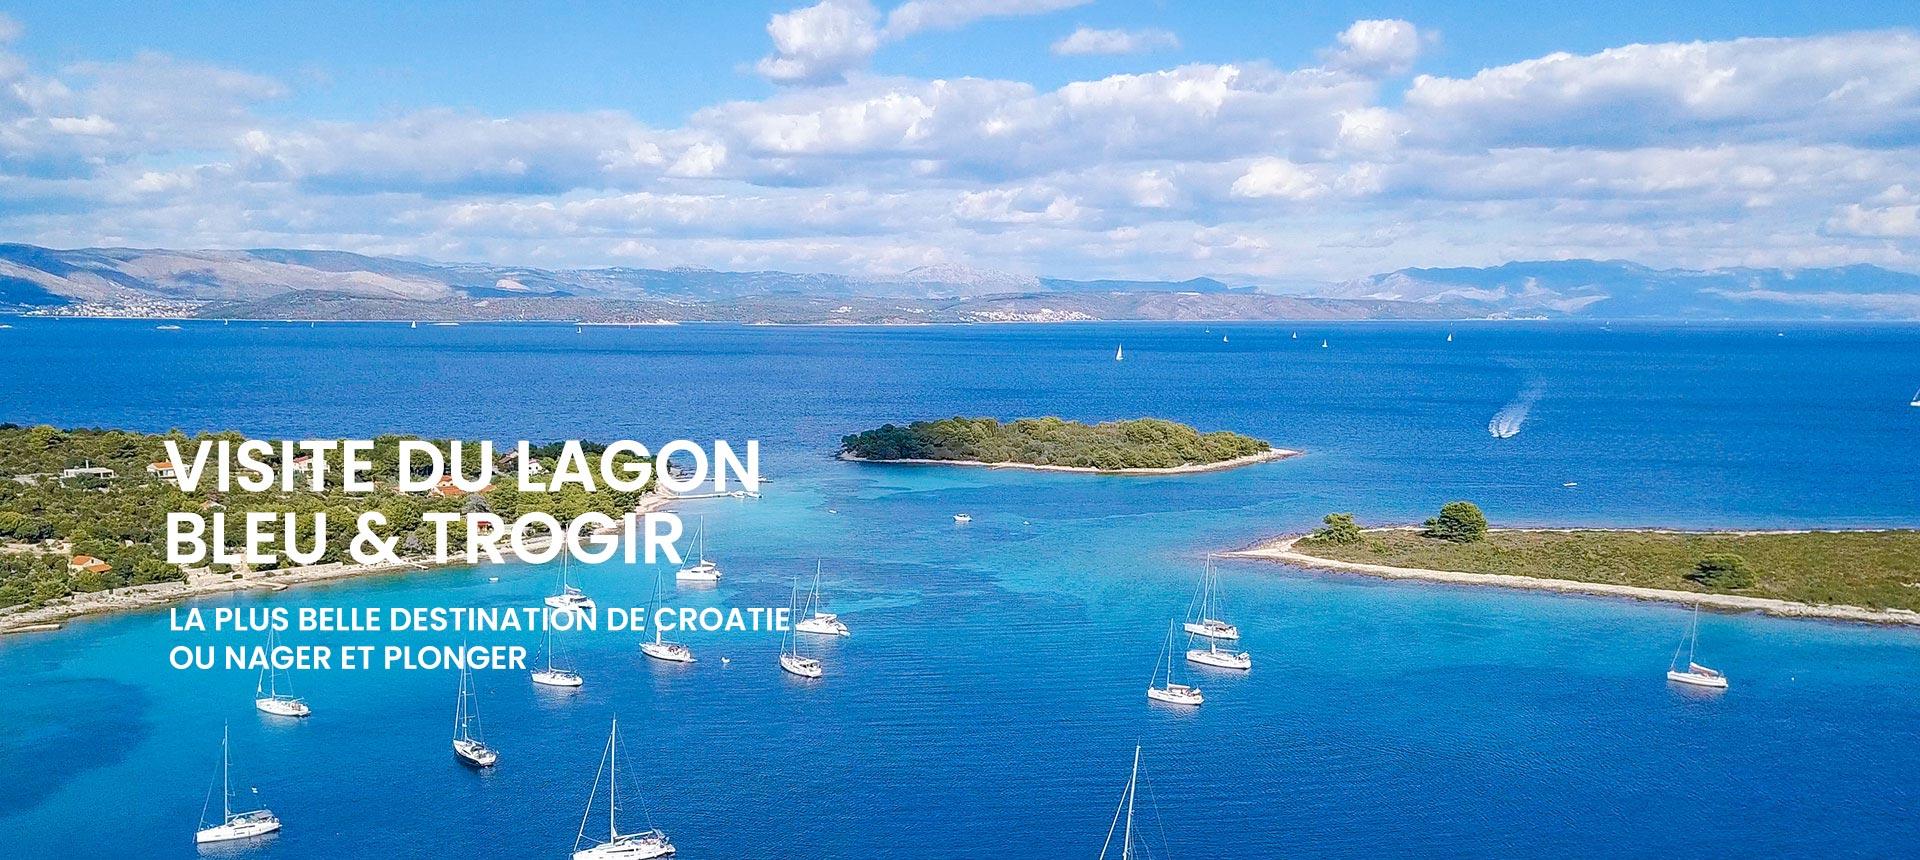 Visite Du Lagon Bleu & Trogir